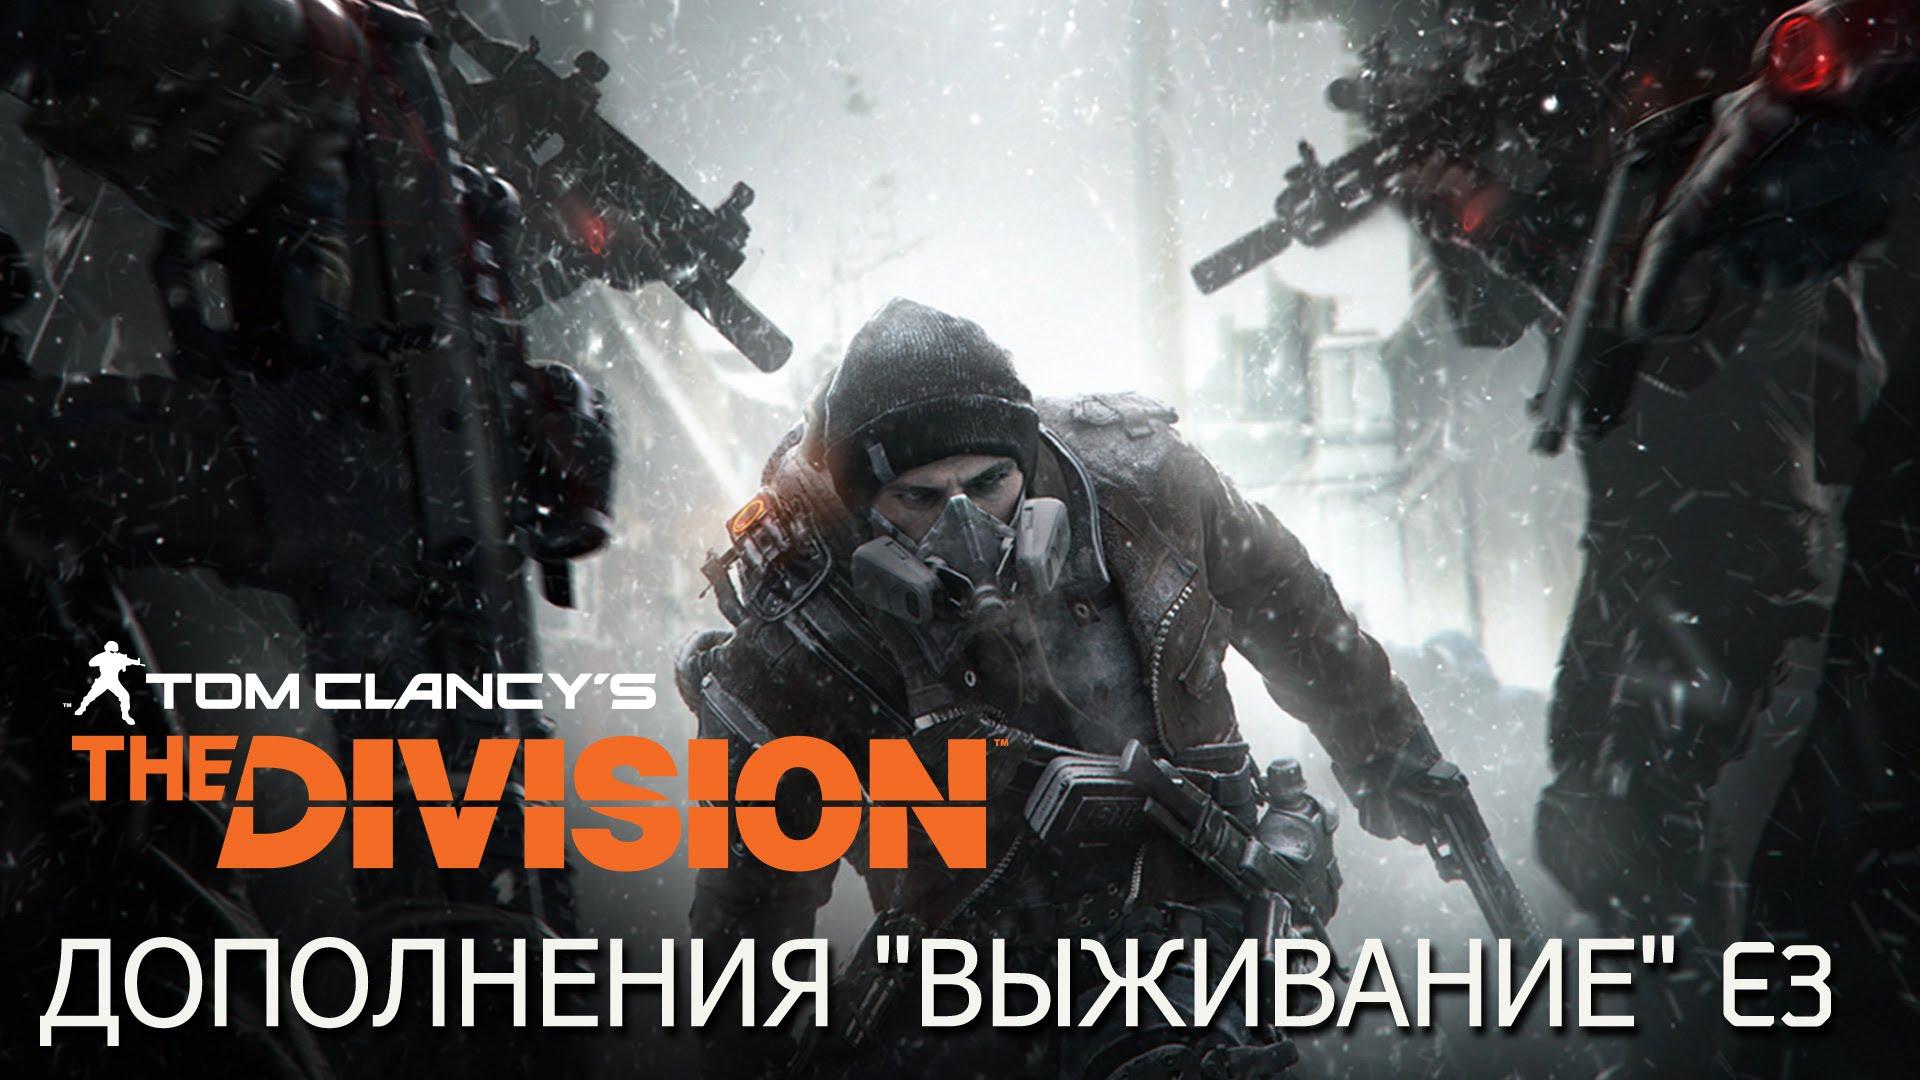 Tom Clancy's The Division — Тизер дополнения «Выживание» — Трейлер E3